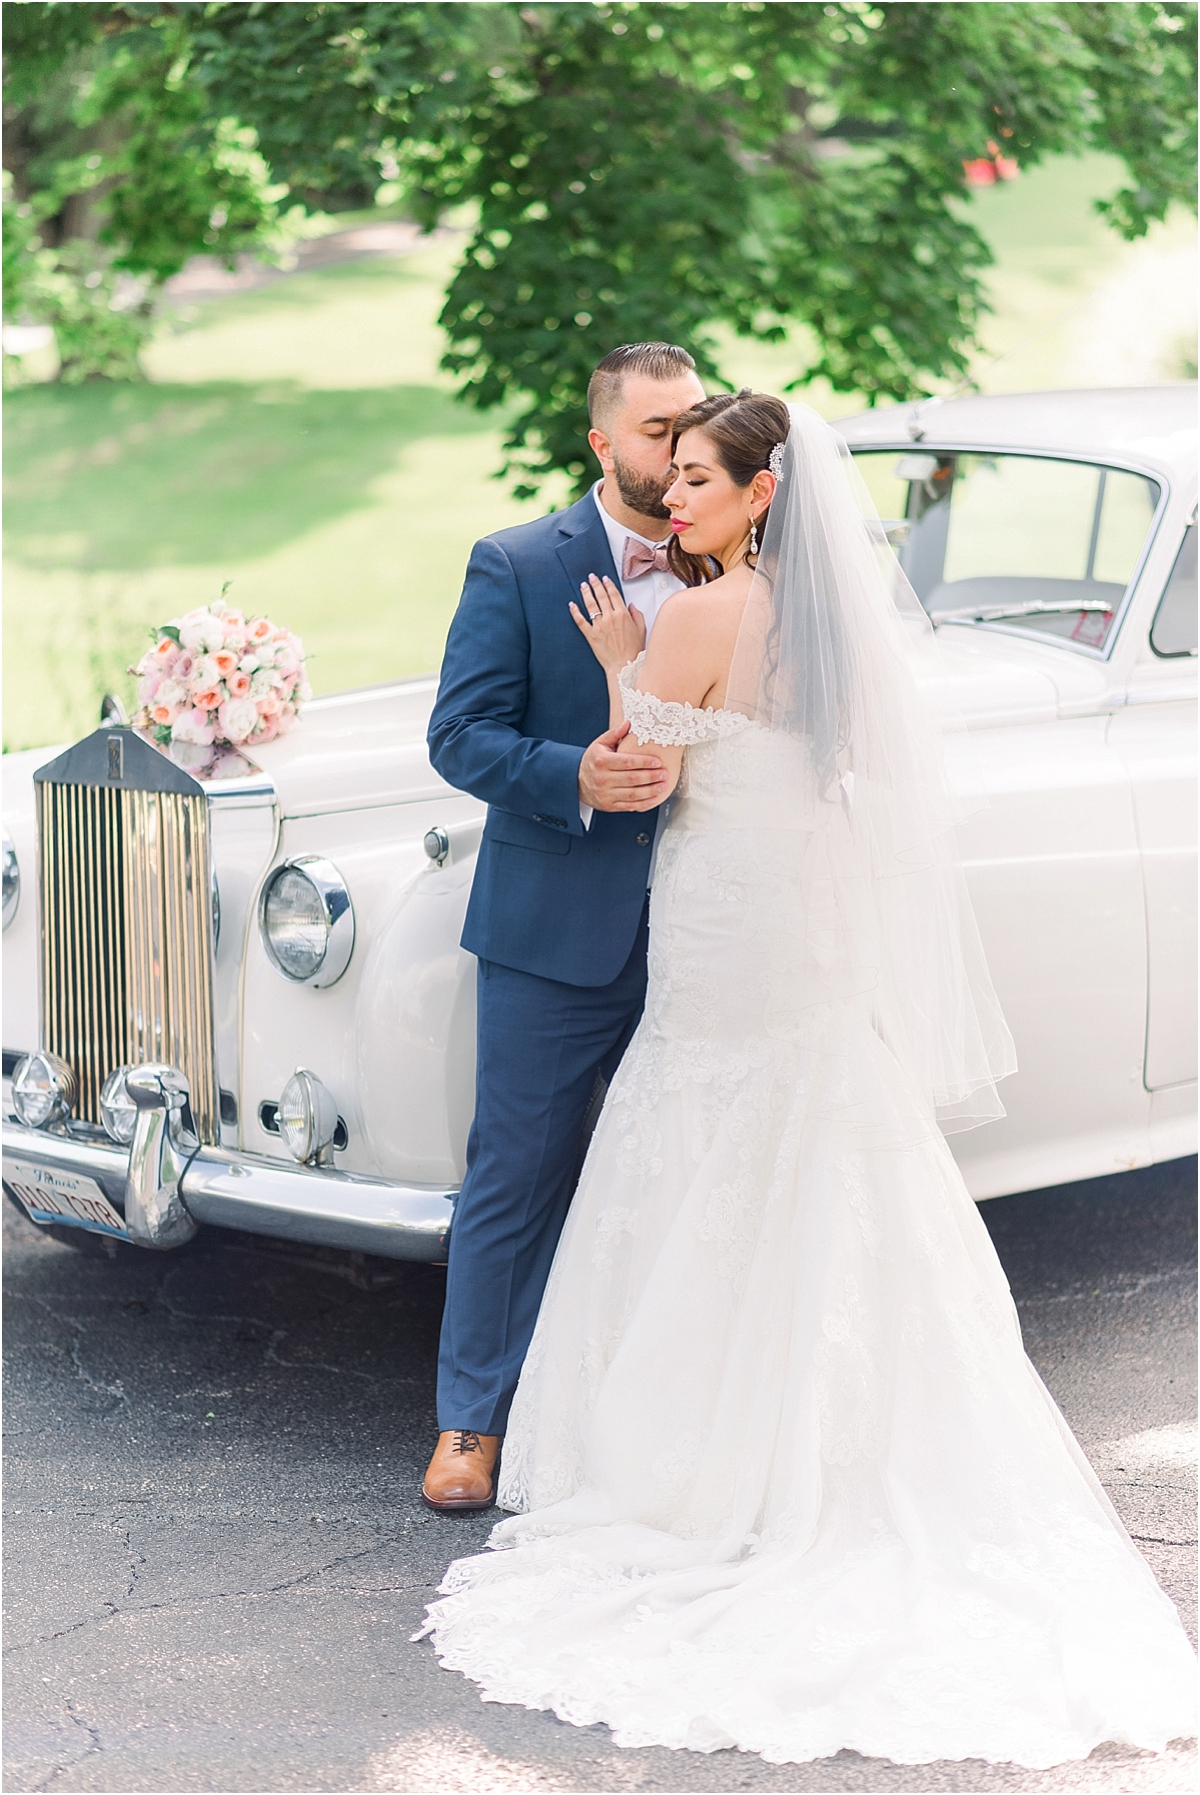 Rancho Los Guzman Wedding Joliet, Joliet Wedding, Joliet Wedding Photographer, Chicago Wedding Photographer, Best Photographer In Joliet, Best Photographer In Chicago, Light And Airy Photographer Chicago_0041.jpg